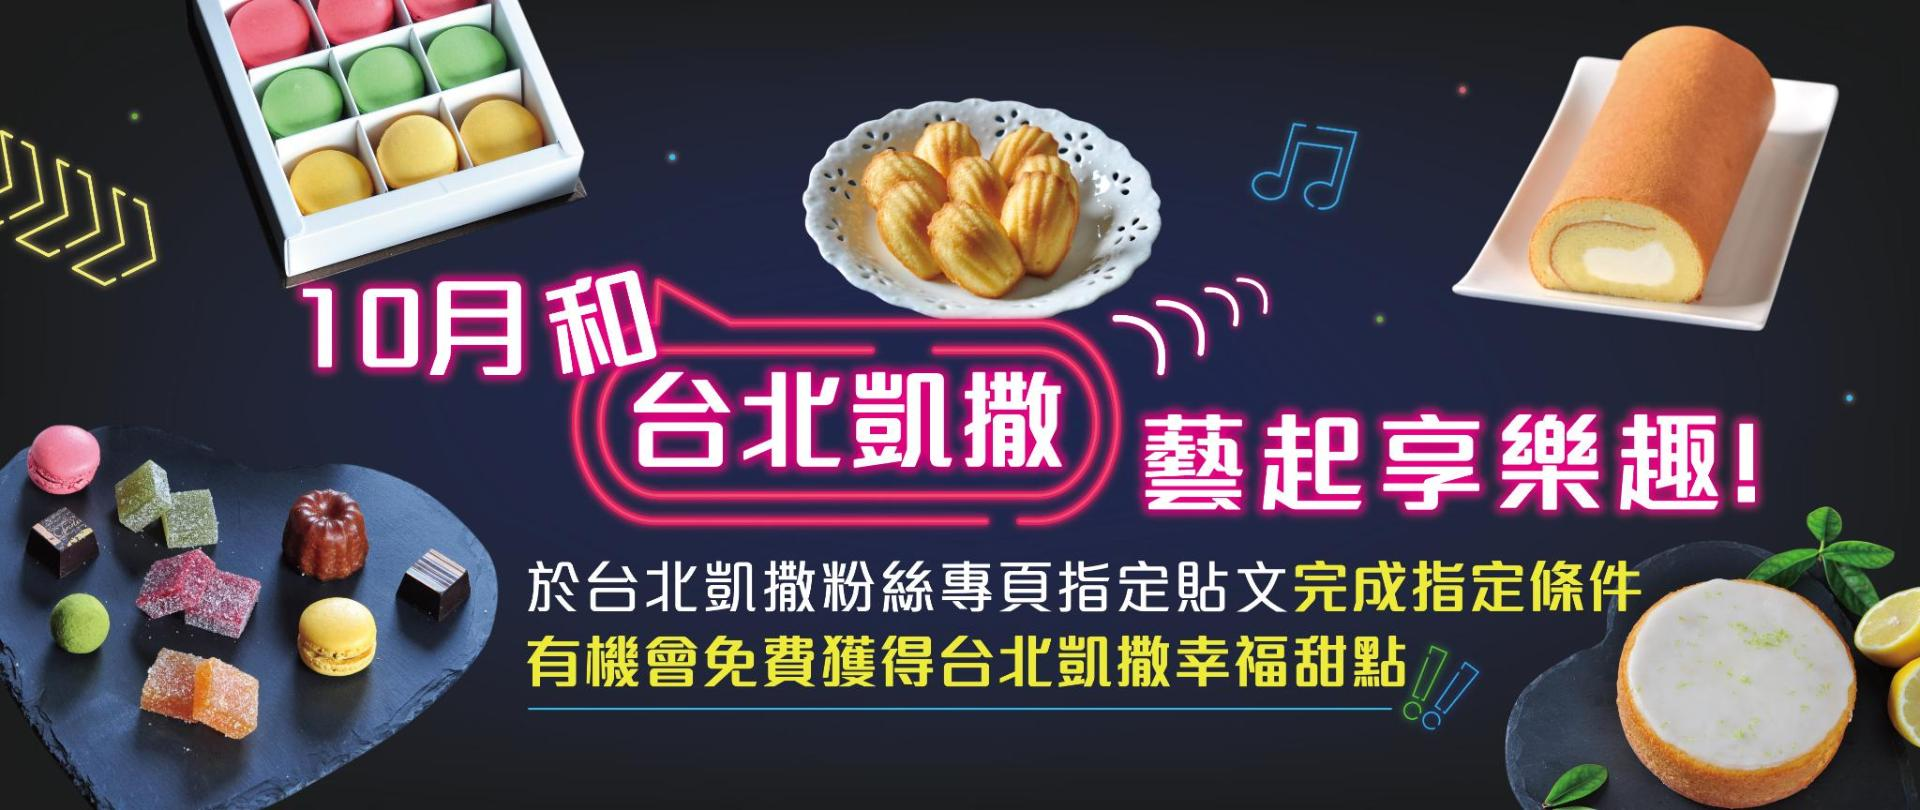 Slide Show1920X810_2018藝起享樂趣.jpg